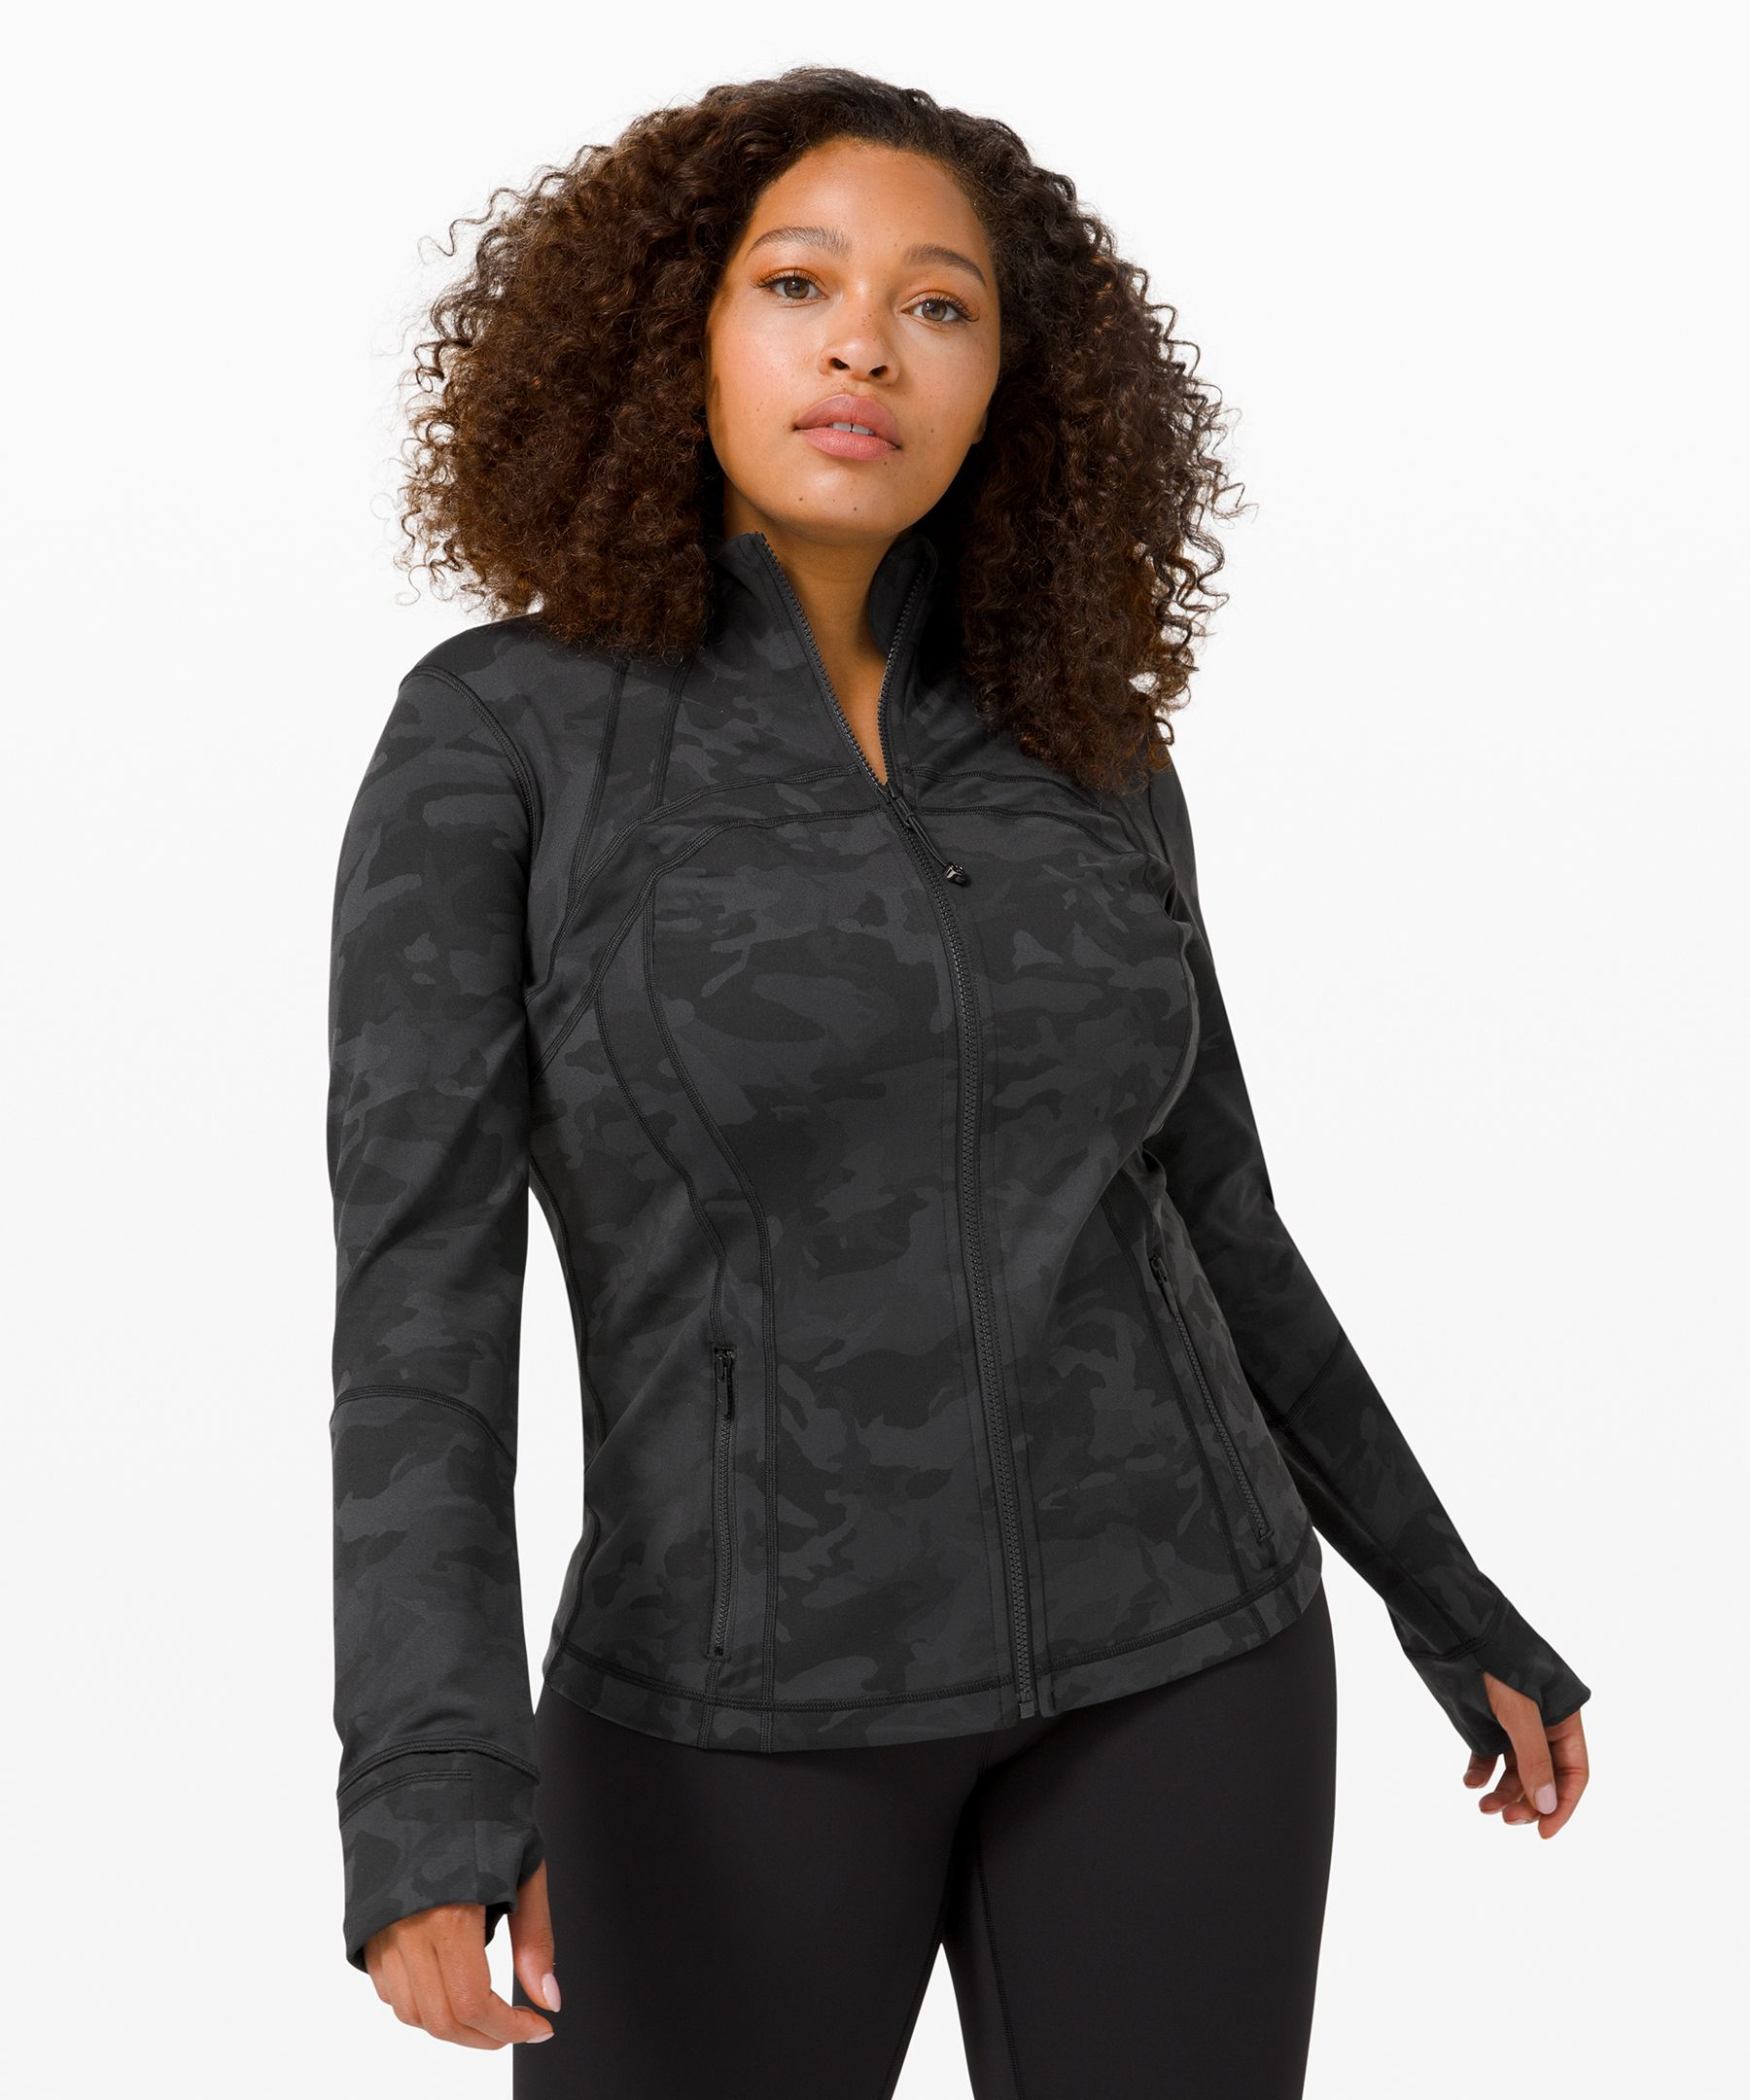 Define Jacket New Full On™ Luon by Lululemon